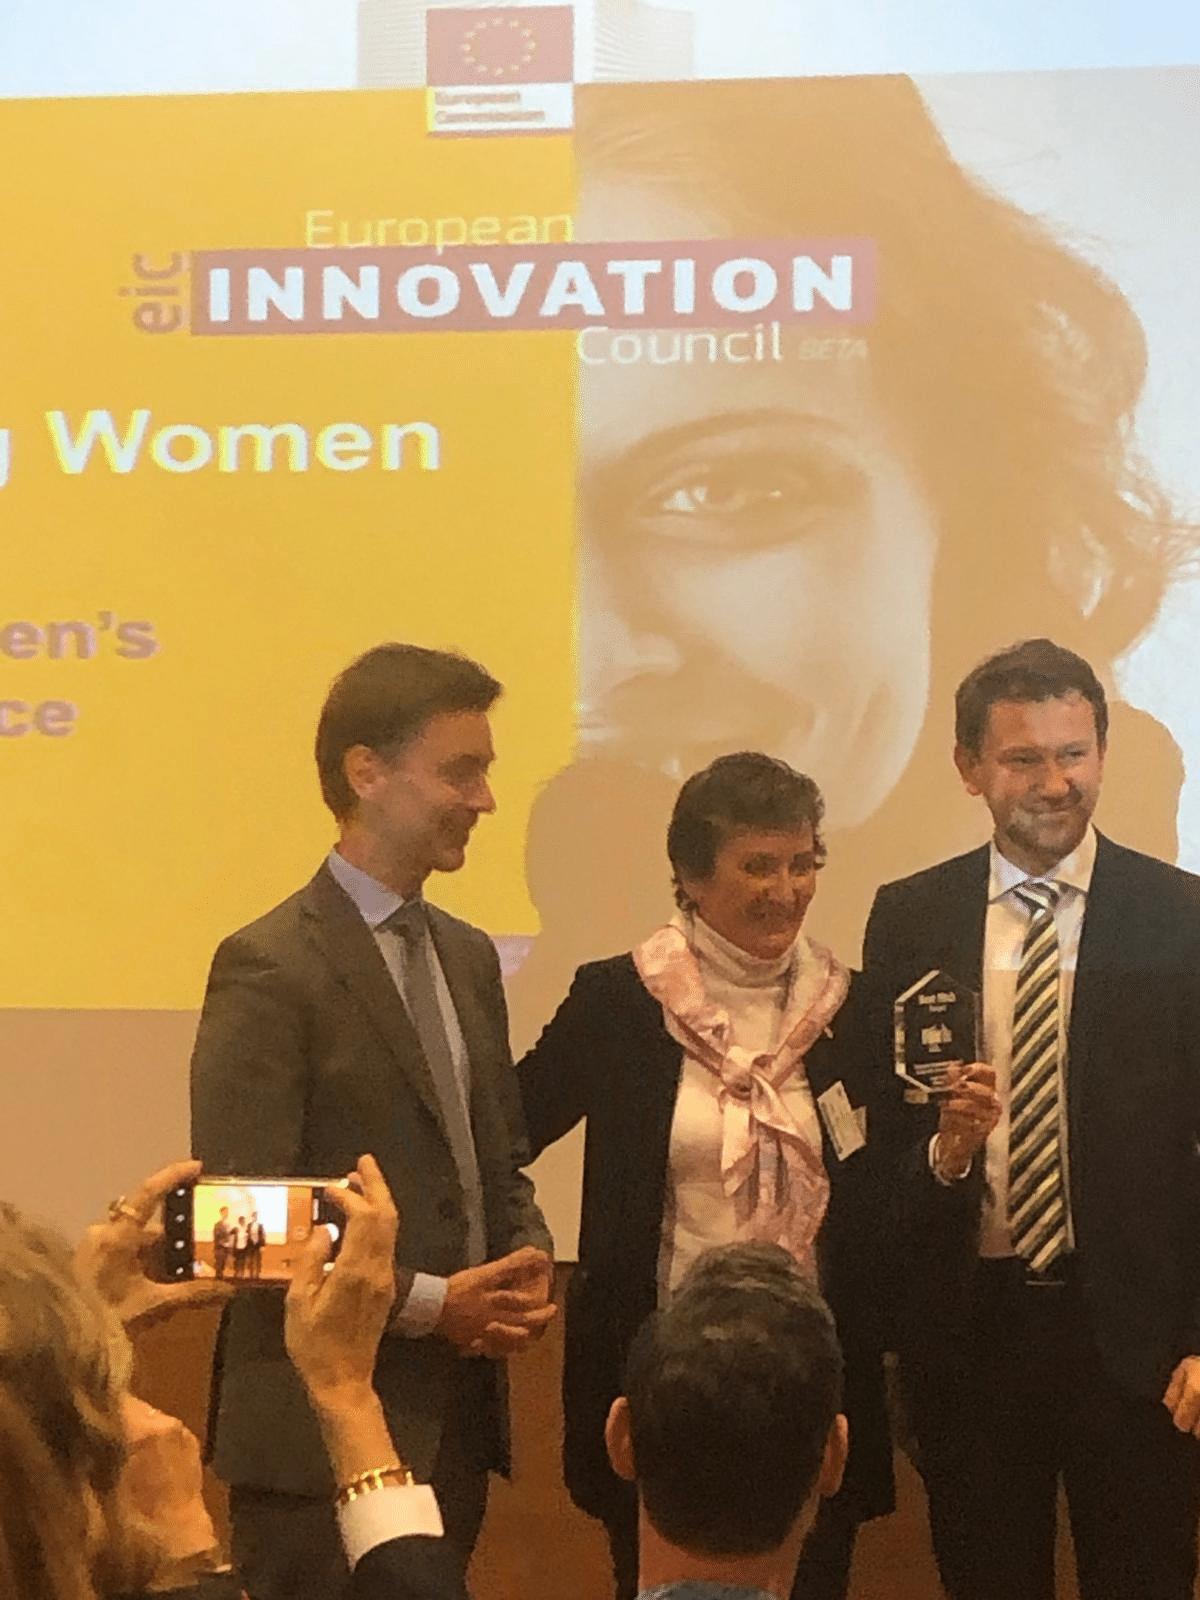 European Innovation Council